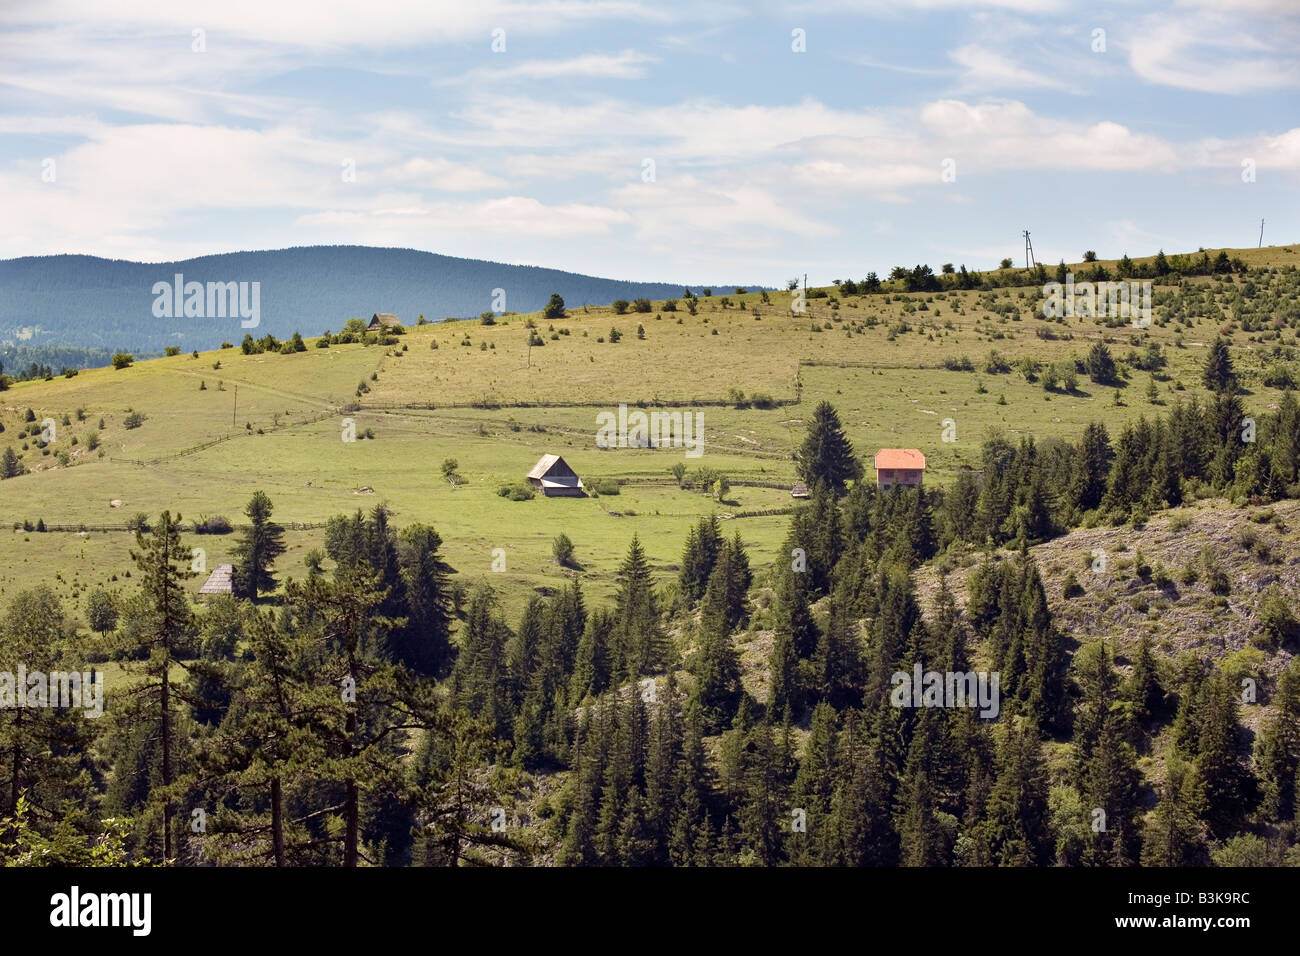 Mountain pastures of Imljani village in Bosnia and Herzegovina Stock Photo